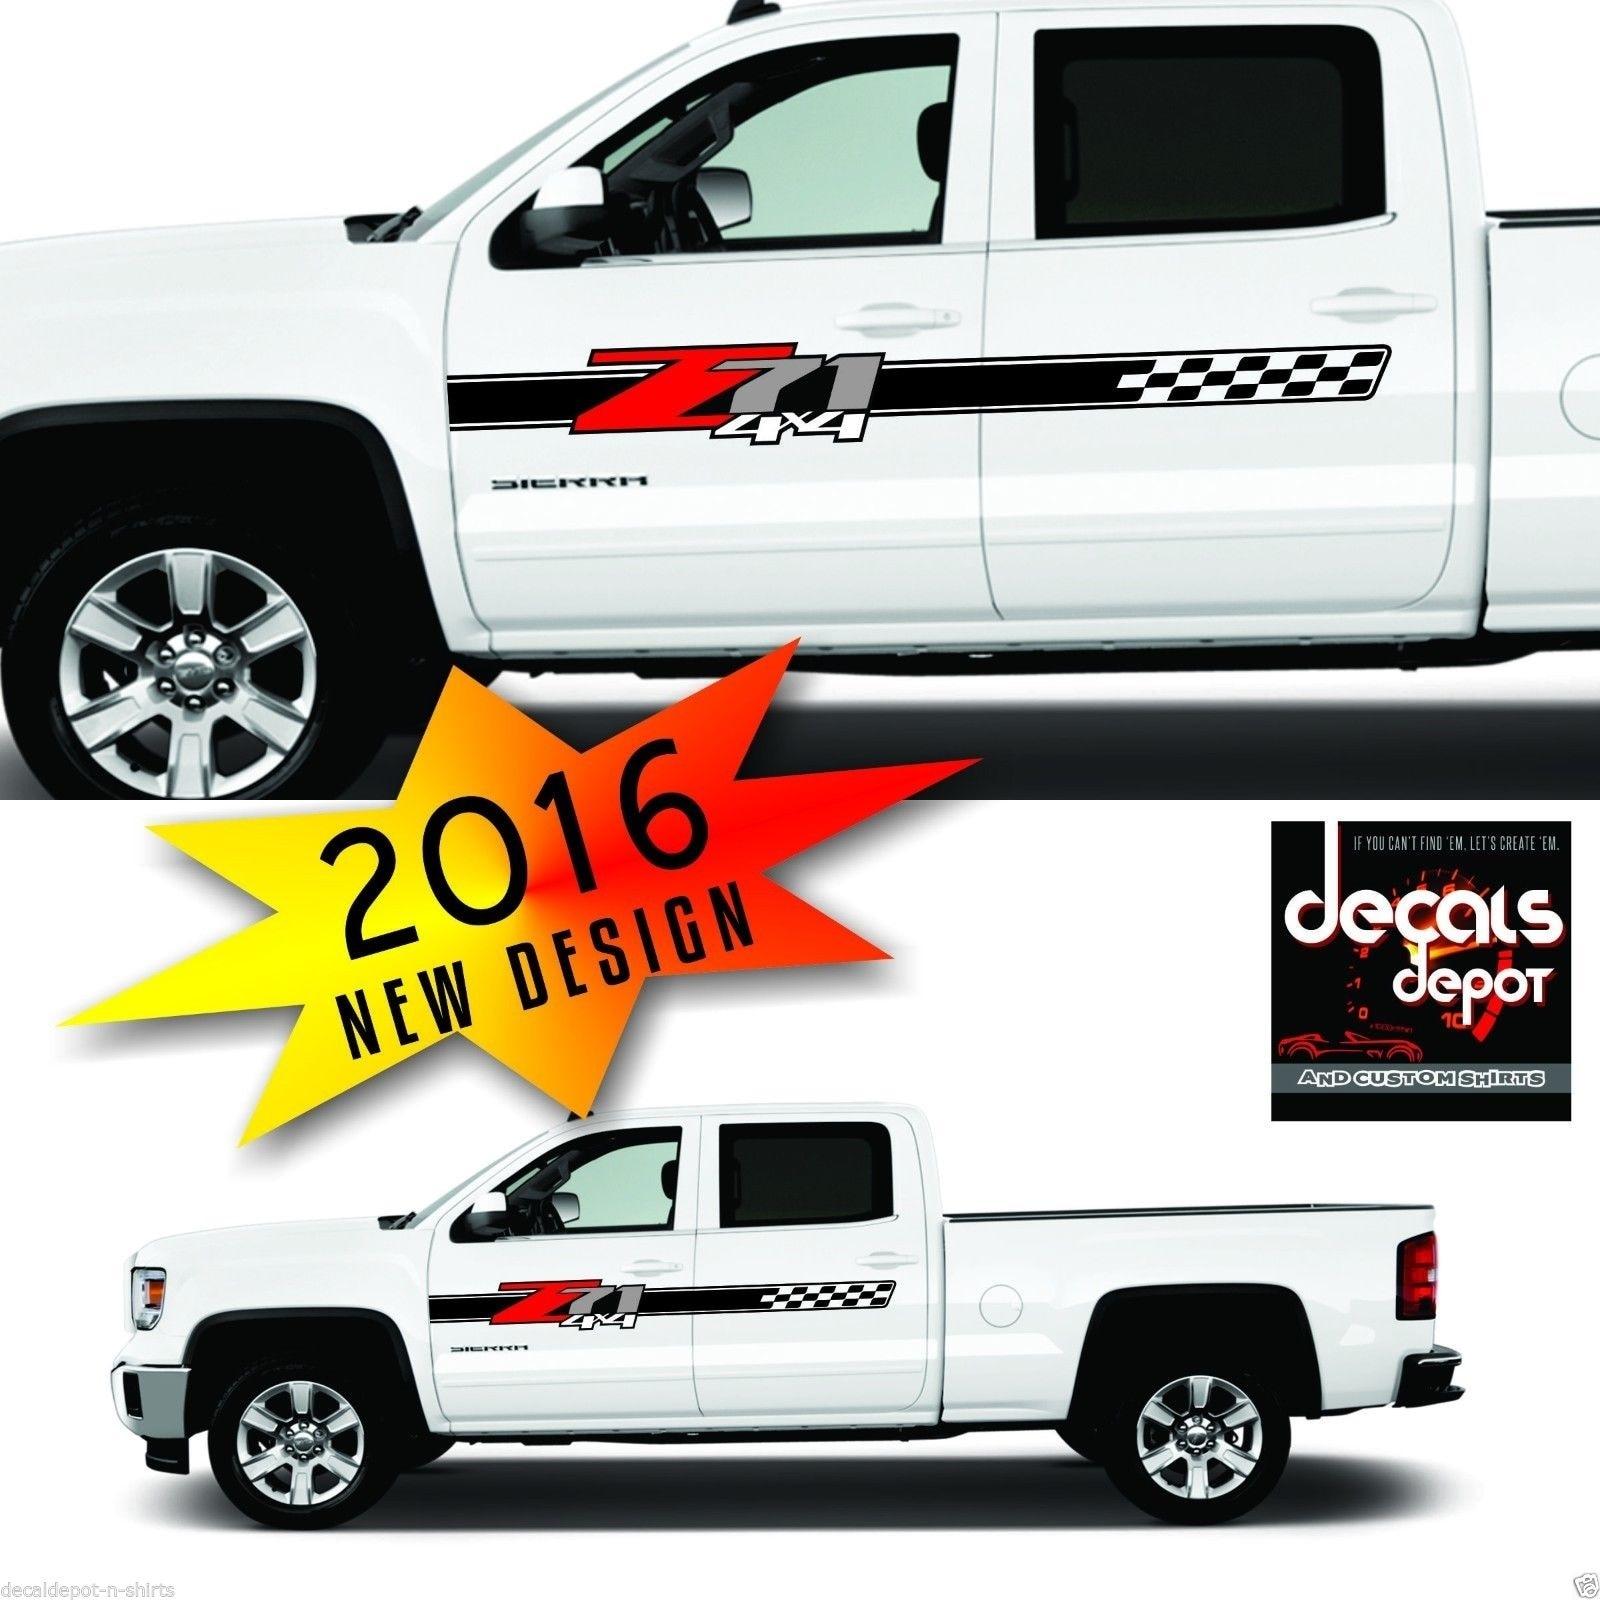 4x4 Mud Tracks Truck Bed Decal Dodge Ram 1500 Chevy Ford Sticker Stripe Vinyl 0 Auto Parts Accessories Car Truck Parts